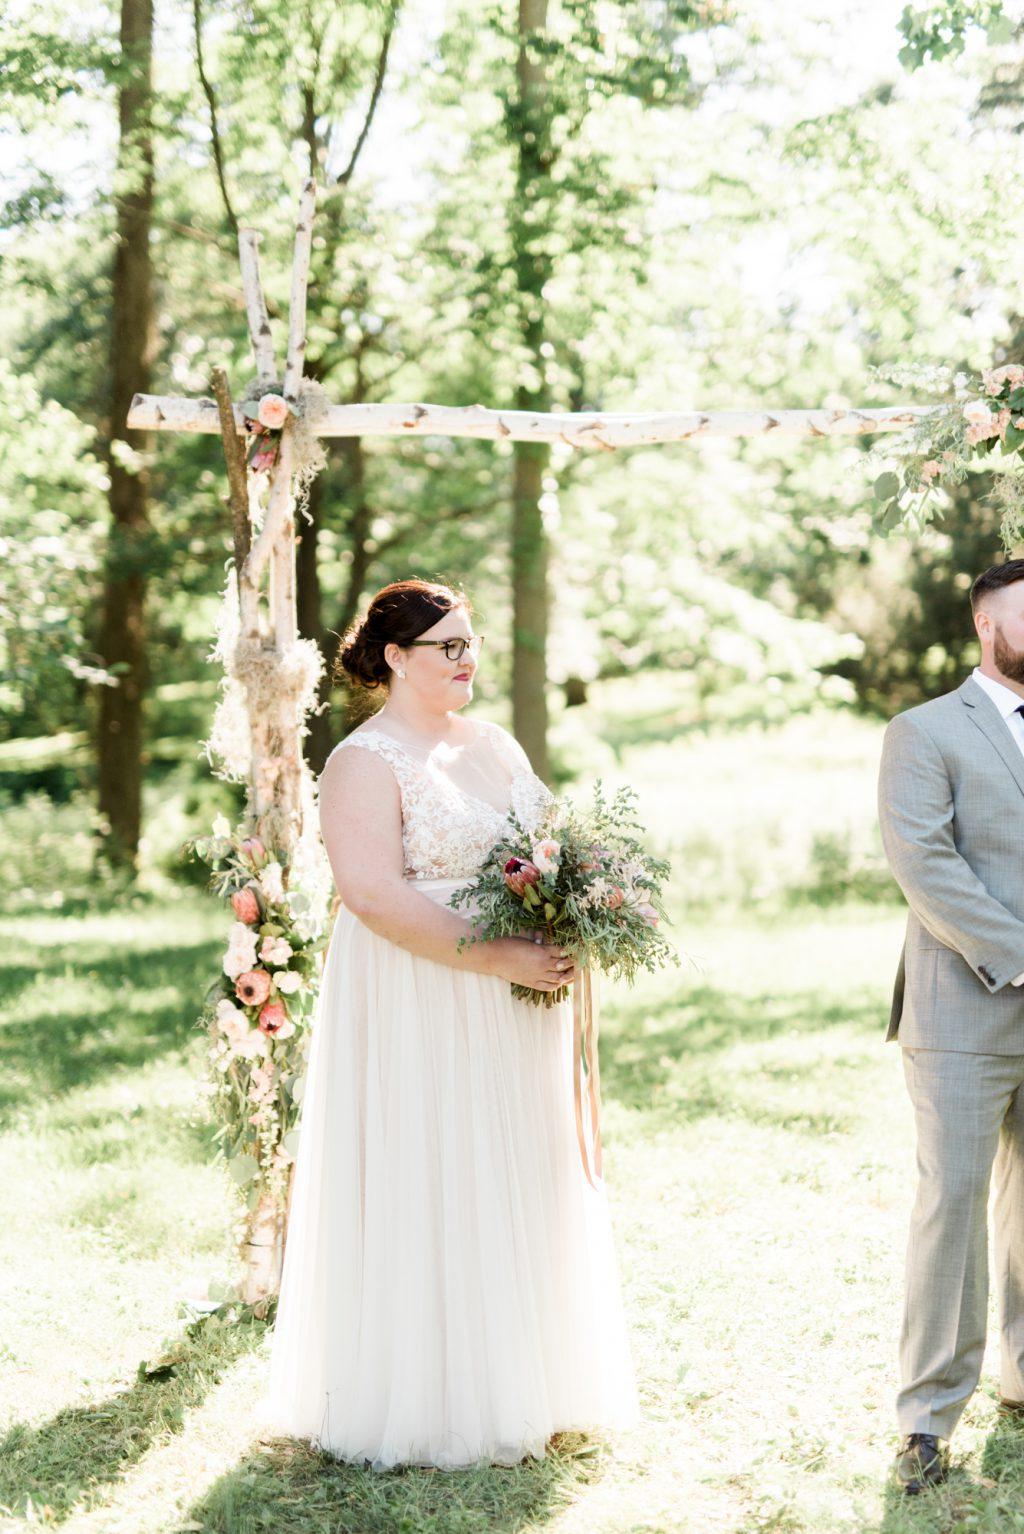 haley-richter-photo-west-chester-summer-wedding-boxcar-brewery-121